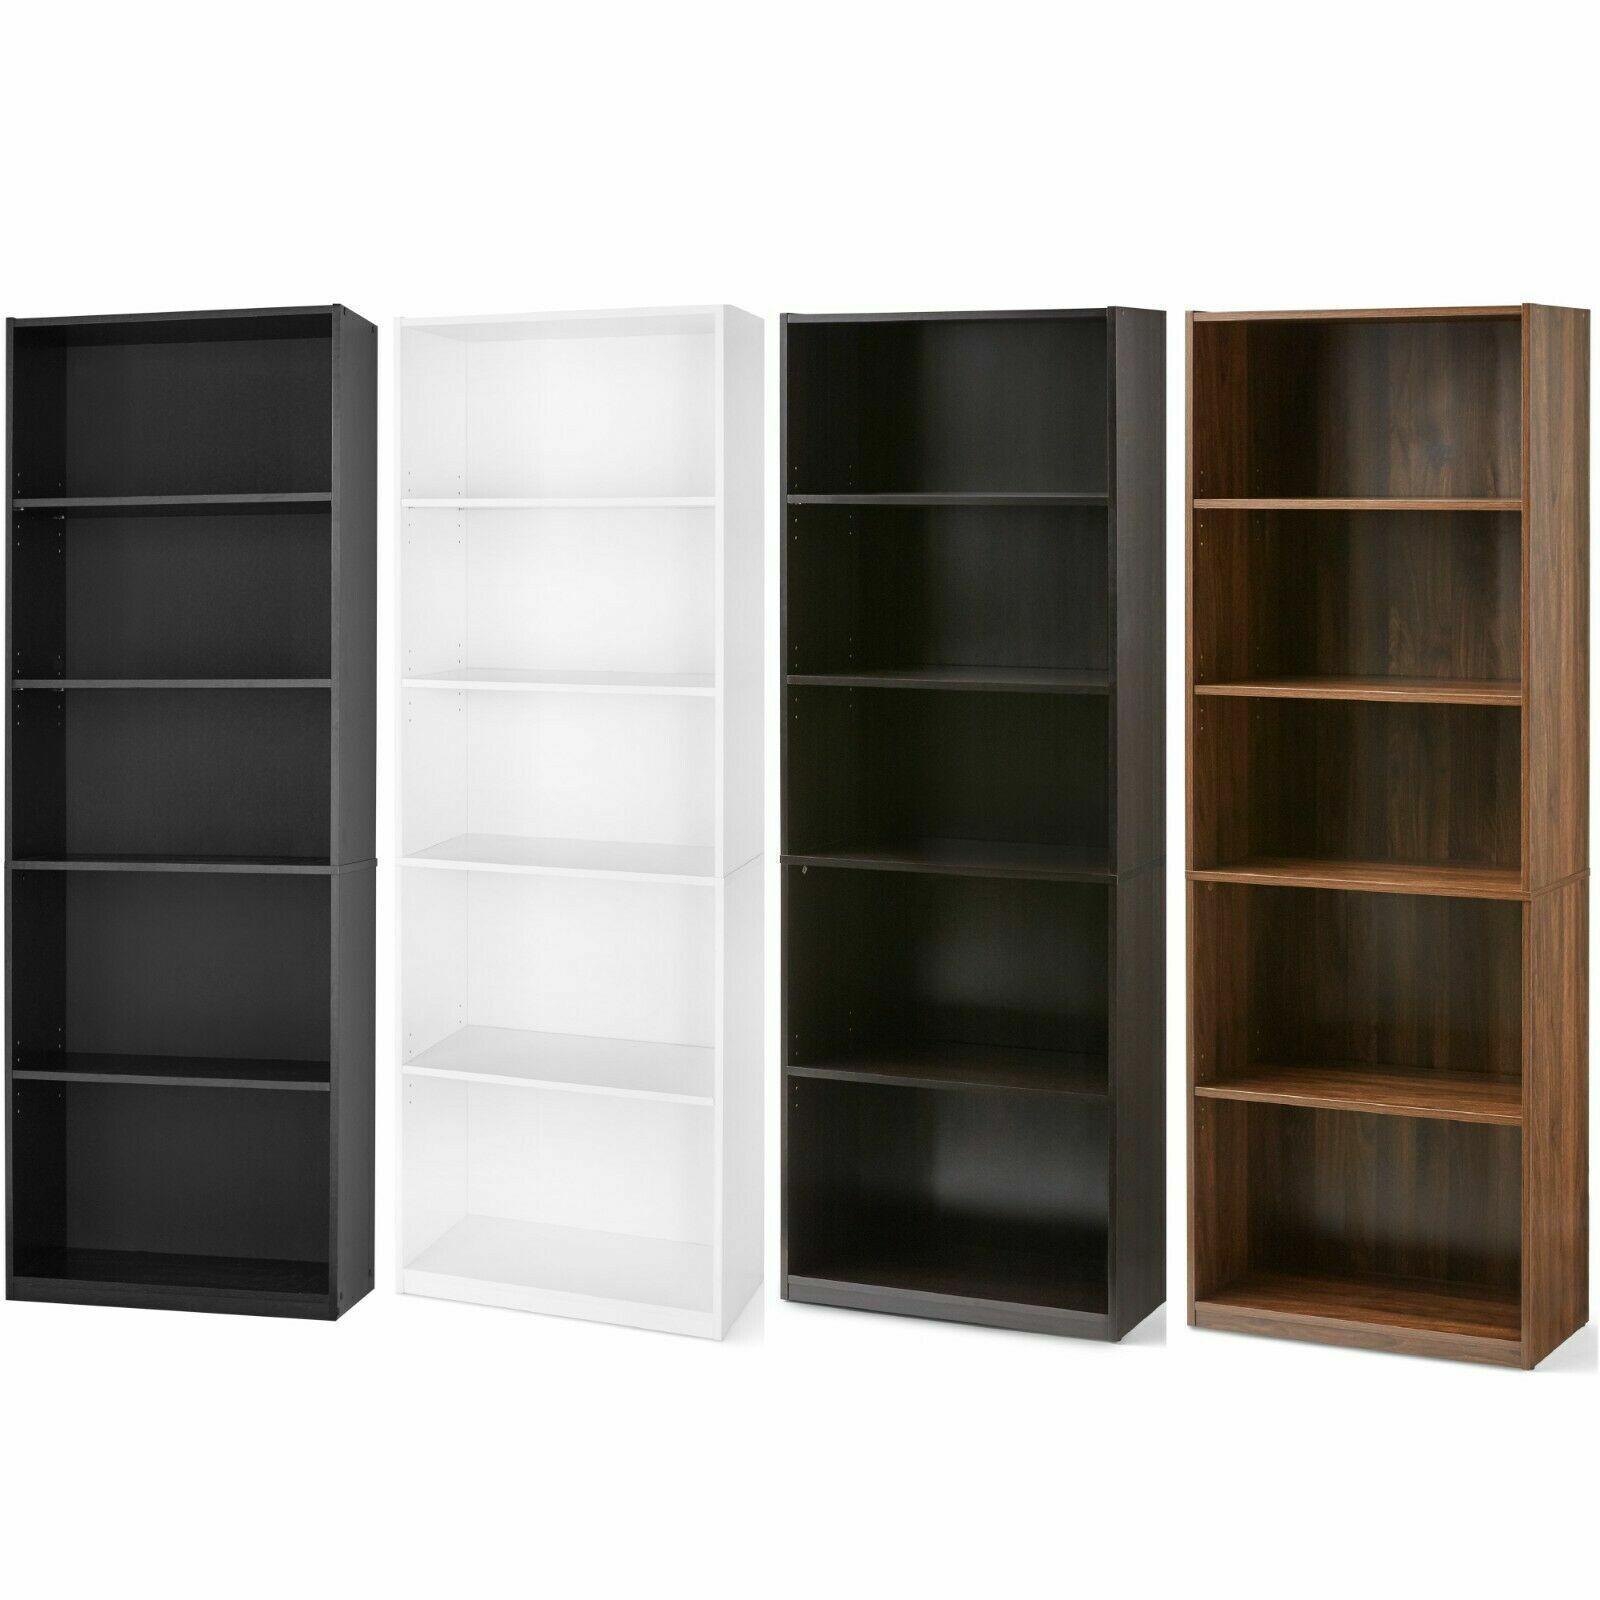 5 Shelf Book Case Adjustable Shelves Storage Unit Wood Tall